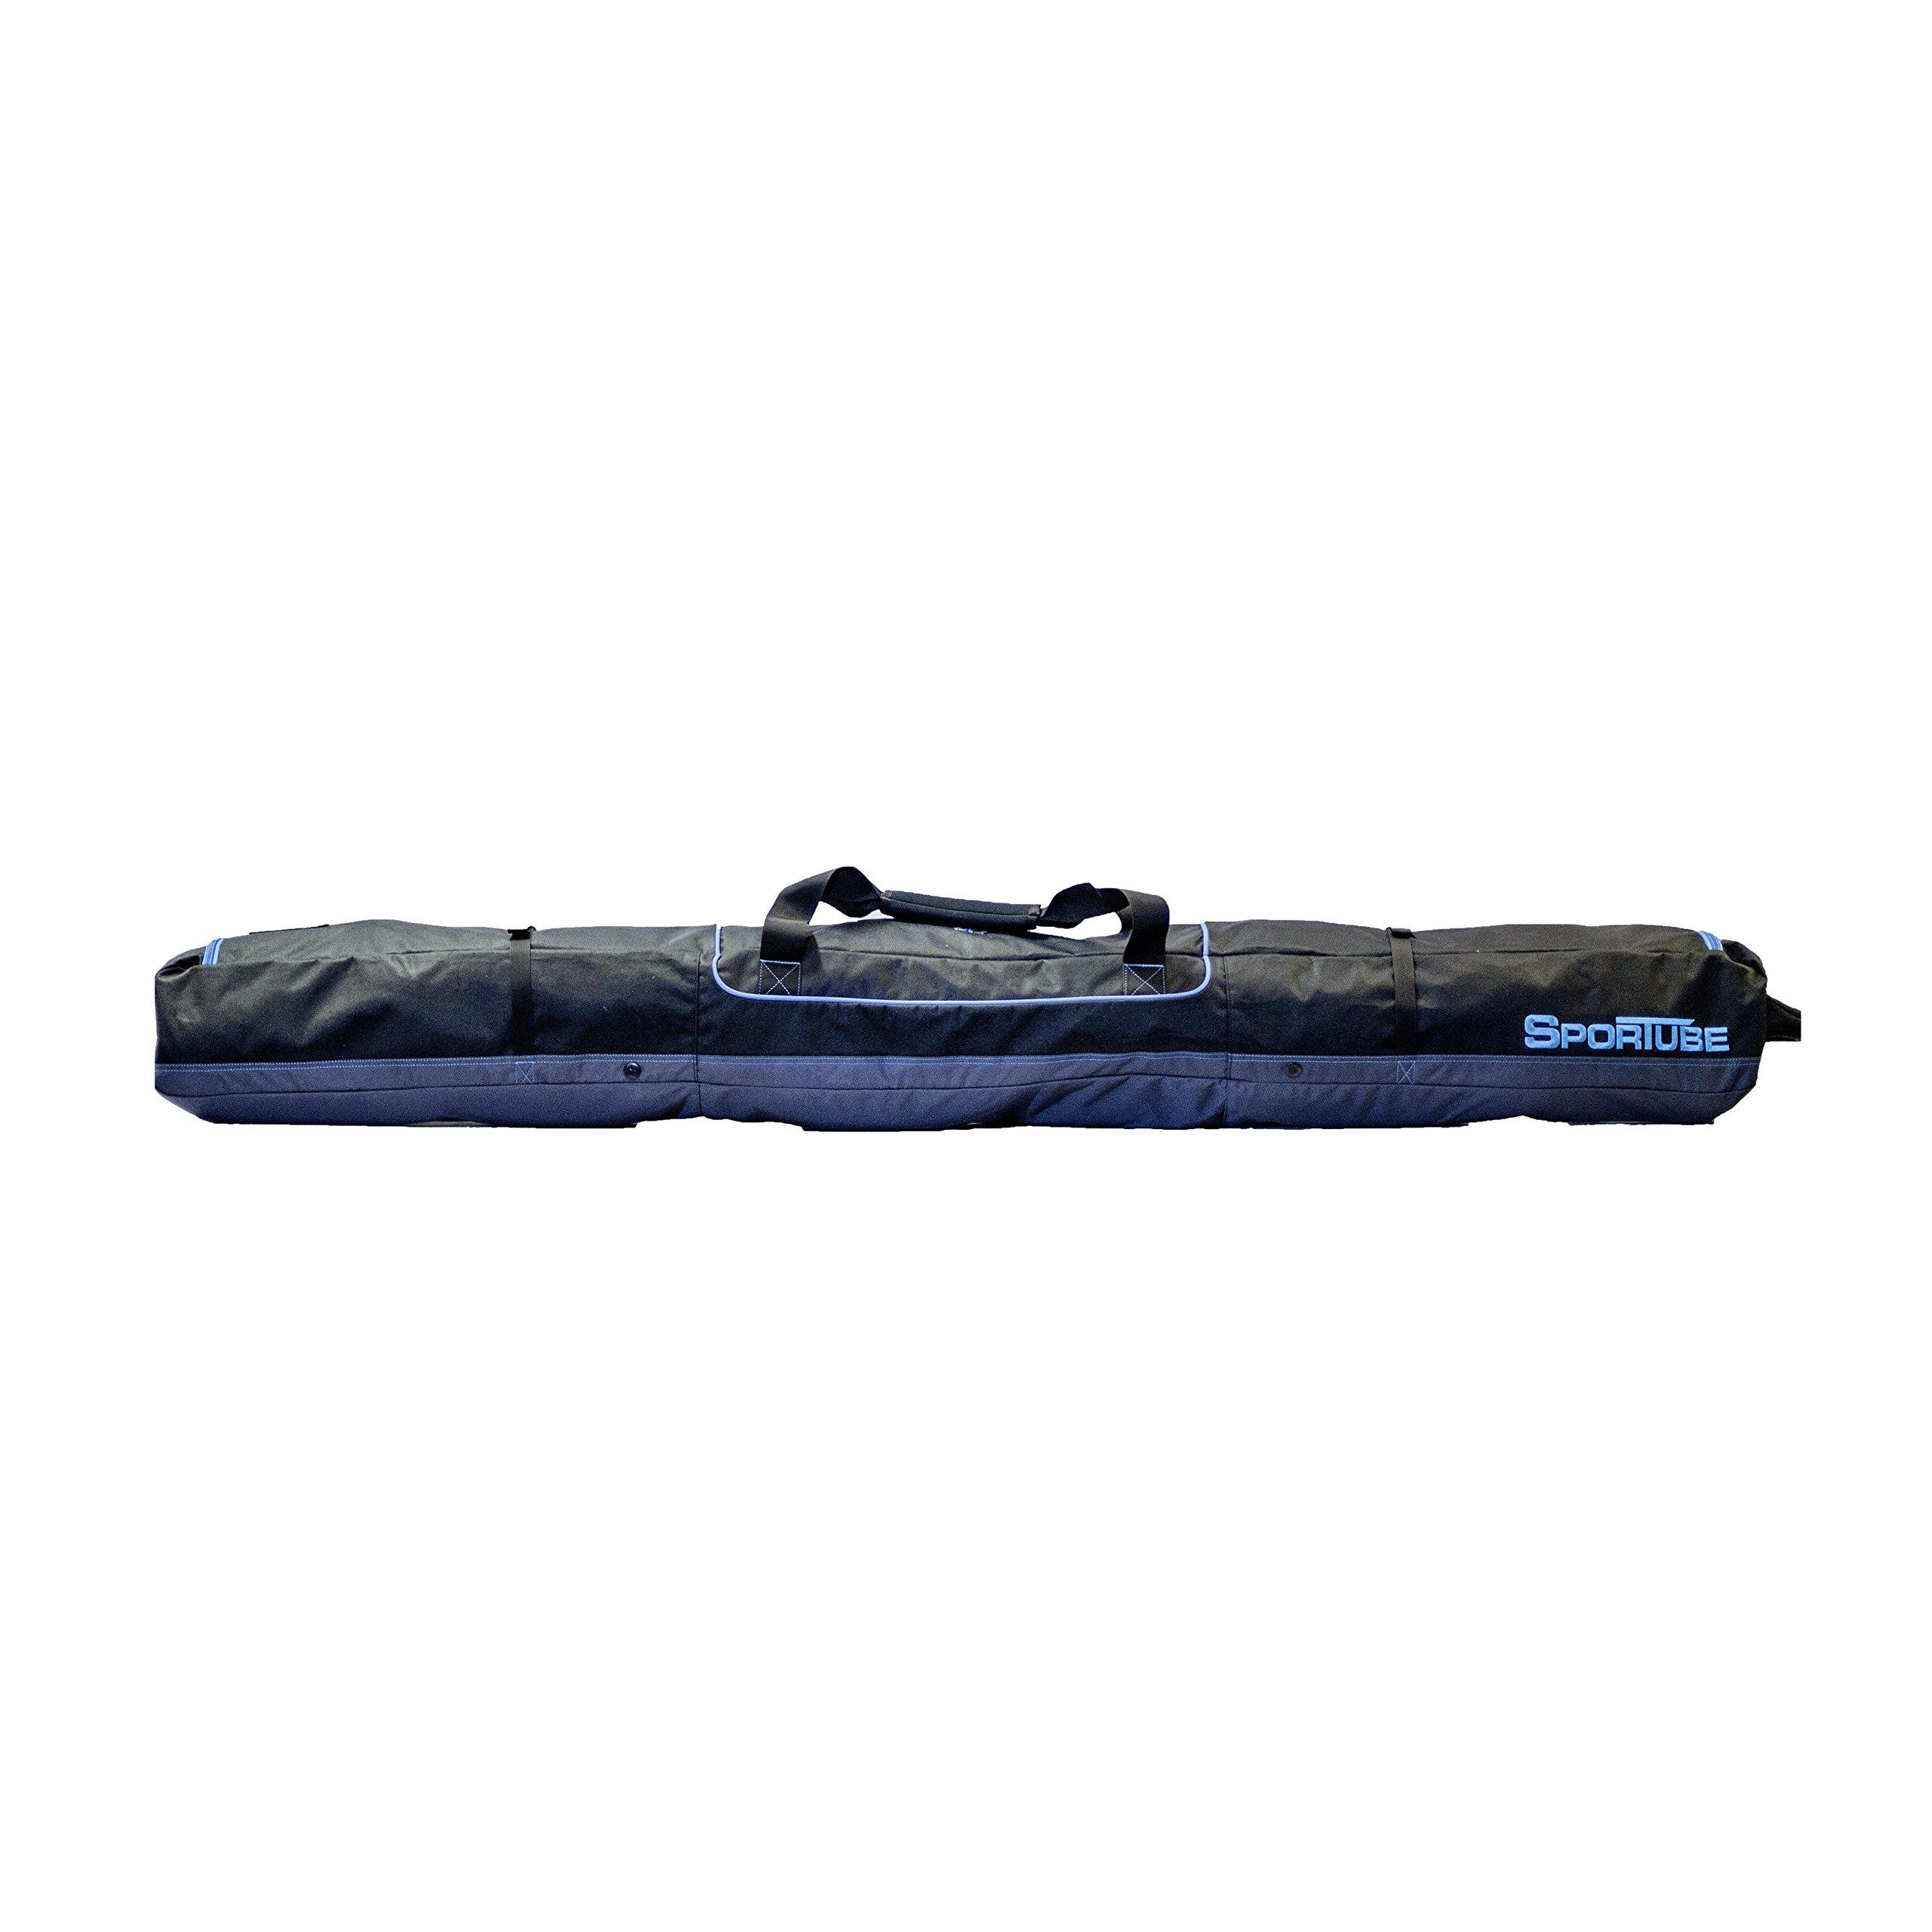 Sportube Traveler Single Ski Bag Blue/Black by Sportube